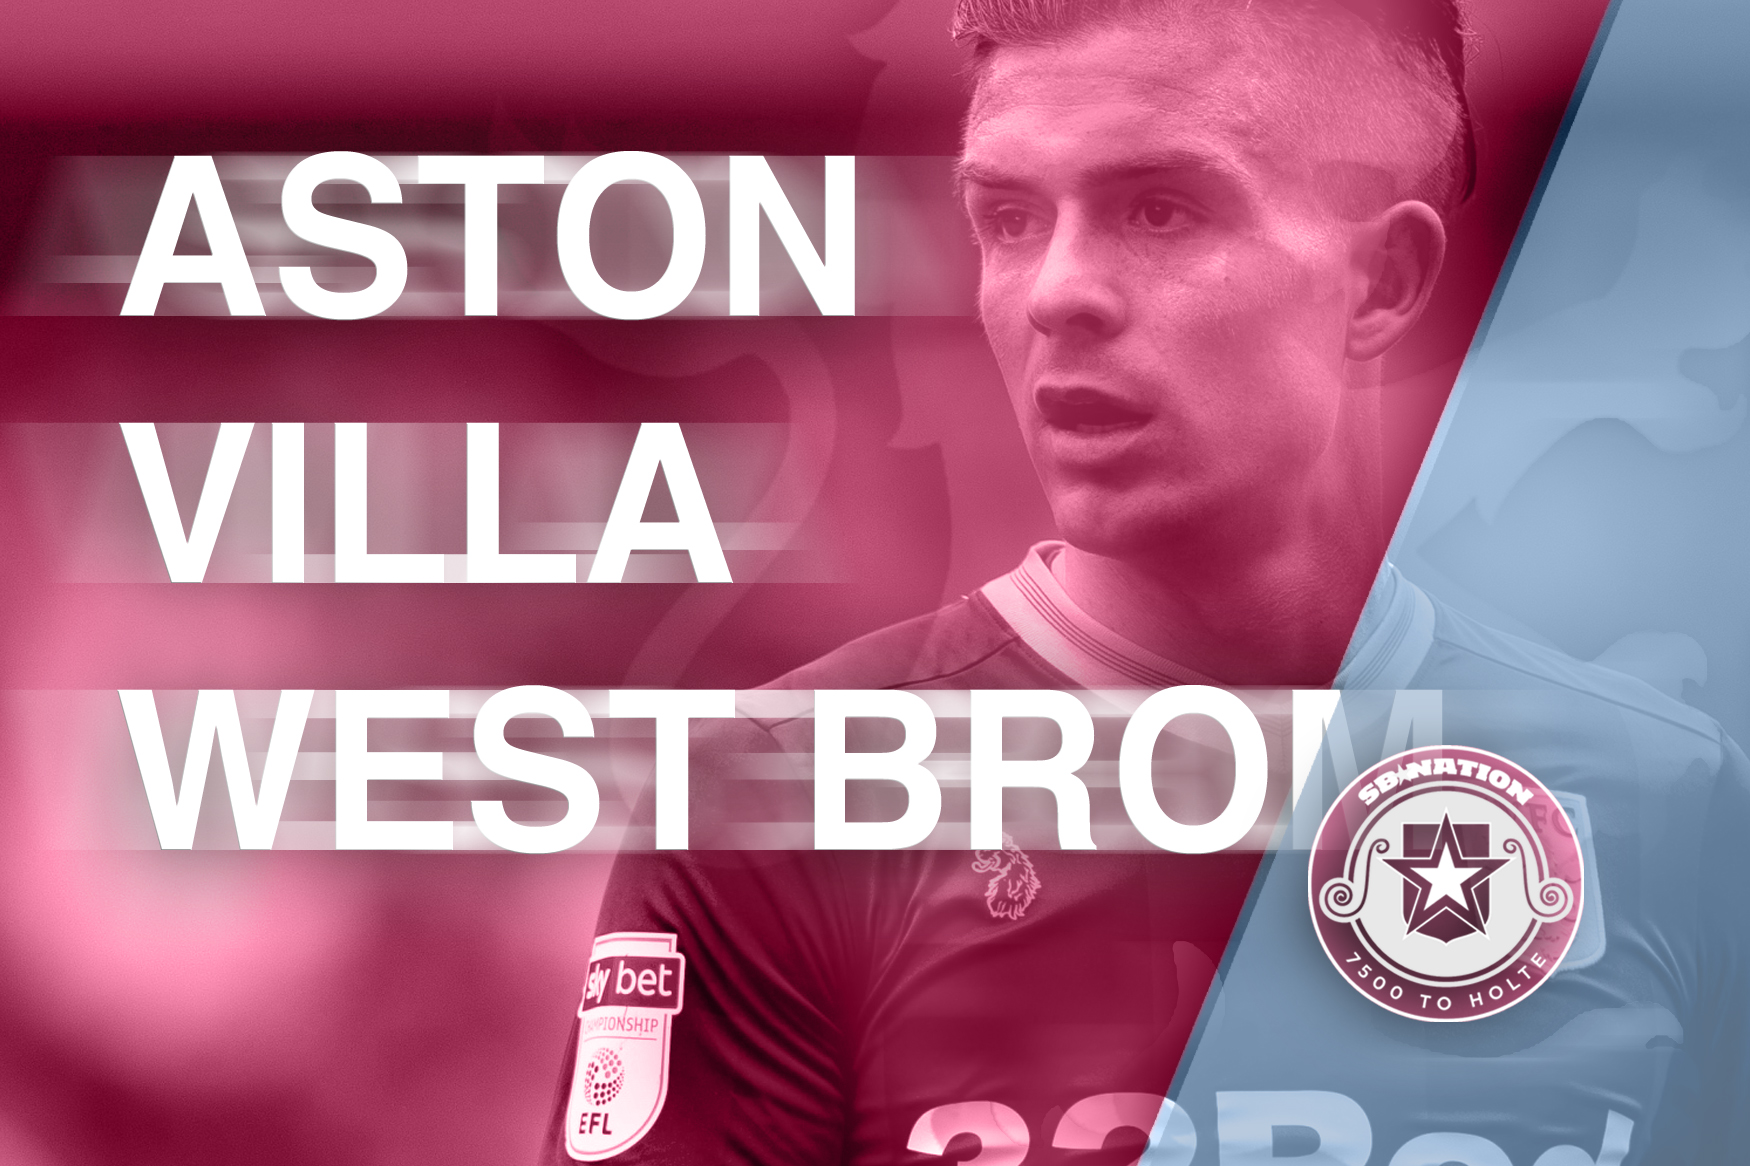 west brom vs aston villa - photo #28